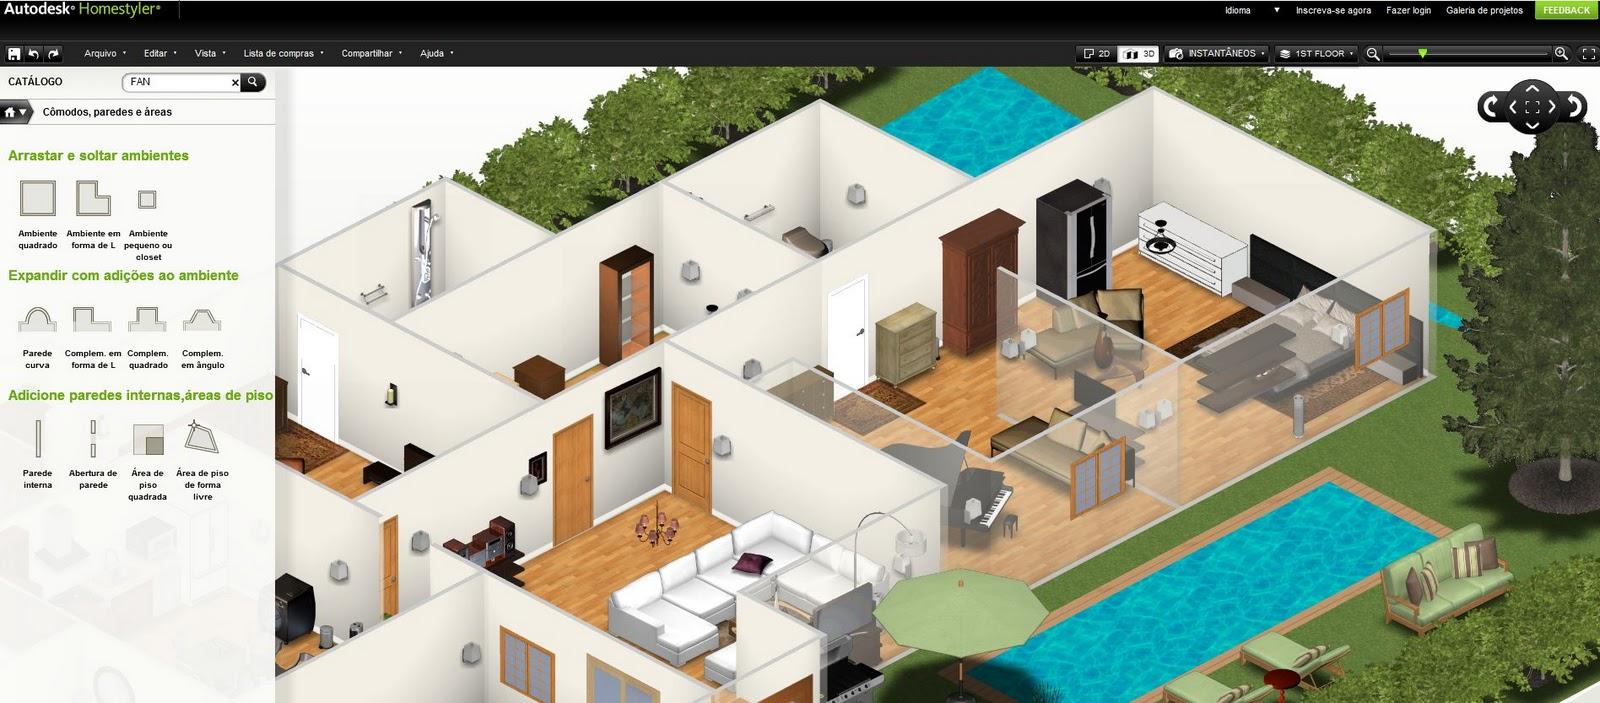 MTbox: Autodesk Homestyler - FLASH